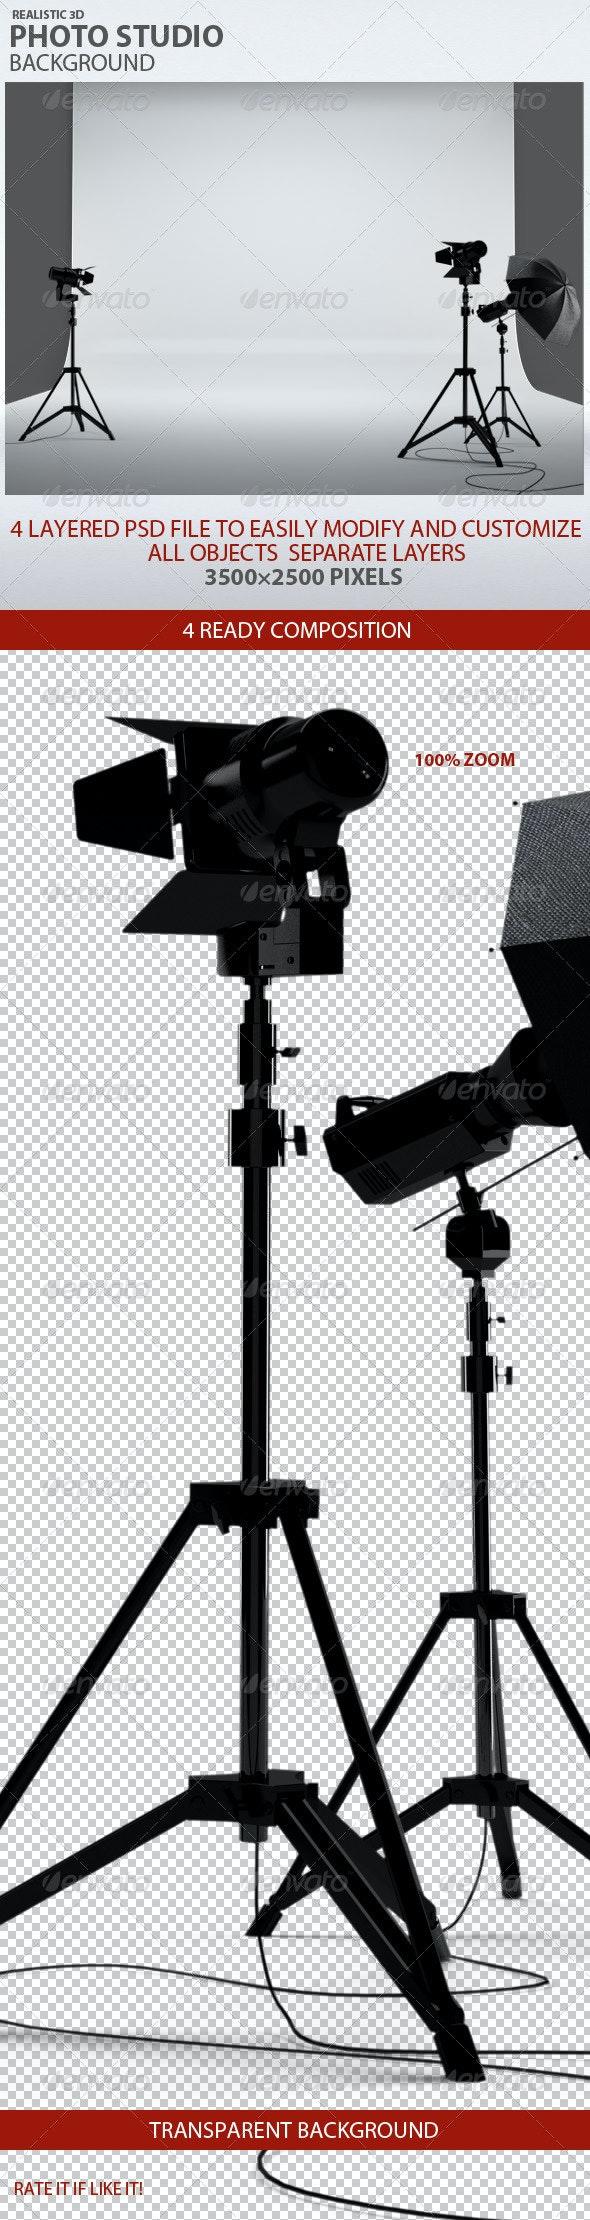 Photo Studio Background - Backgrounds Graphics